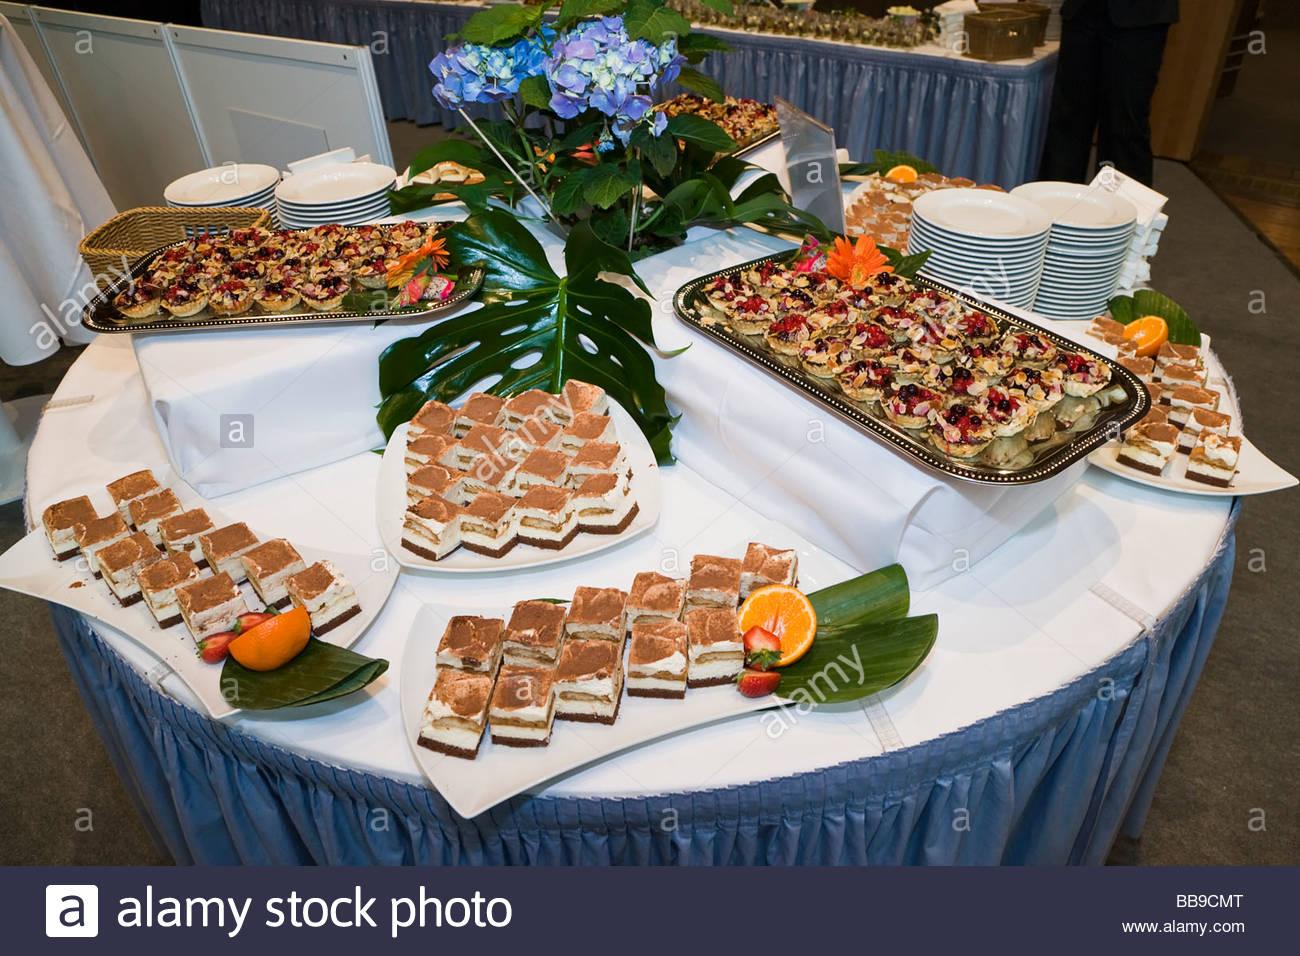 dessert buffet table food tiramisu fruit cookies eating. Black Bedroom Furniture Sets. Home Design Ideas